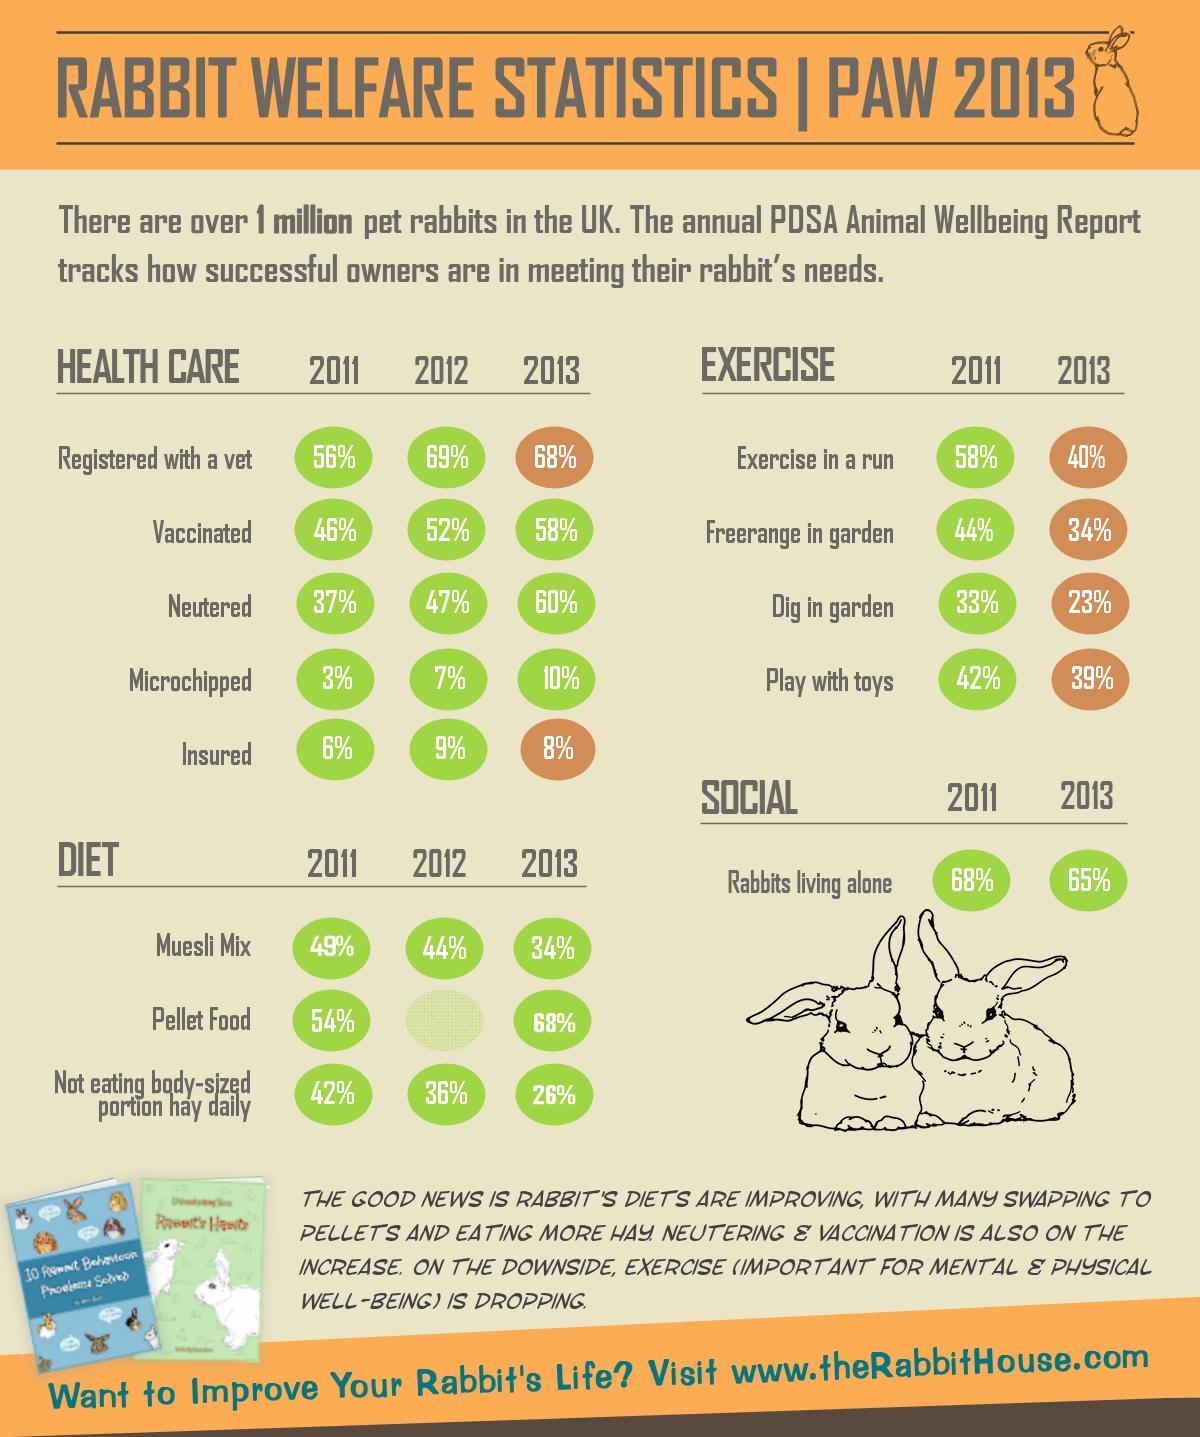 Rabbit Welfare Statistics – PAW Report 2013